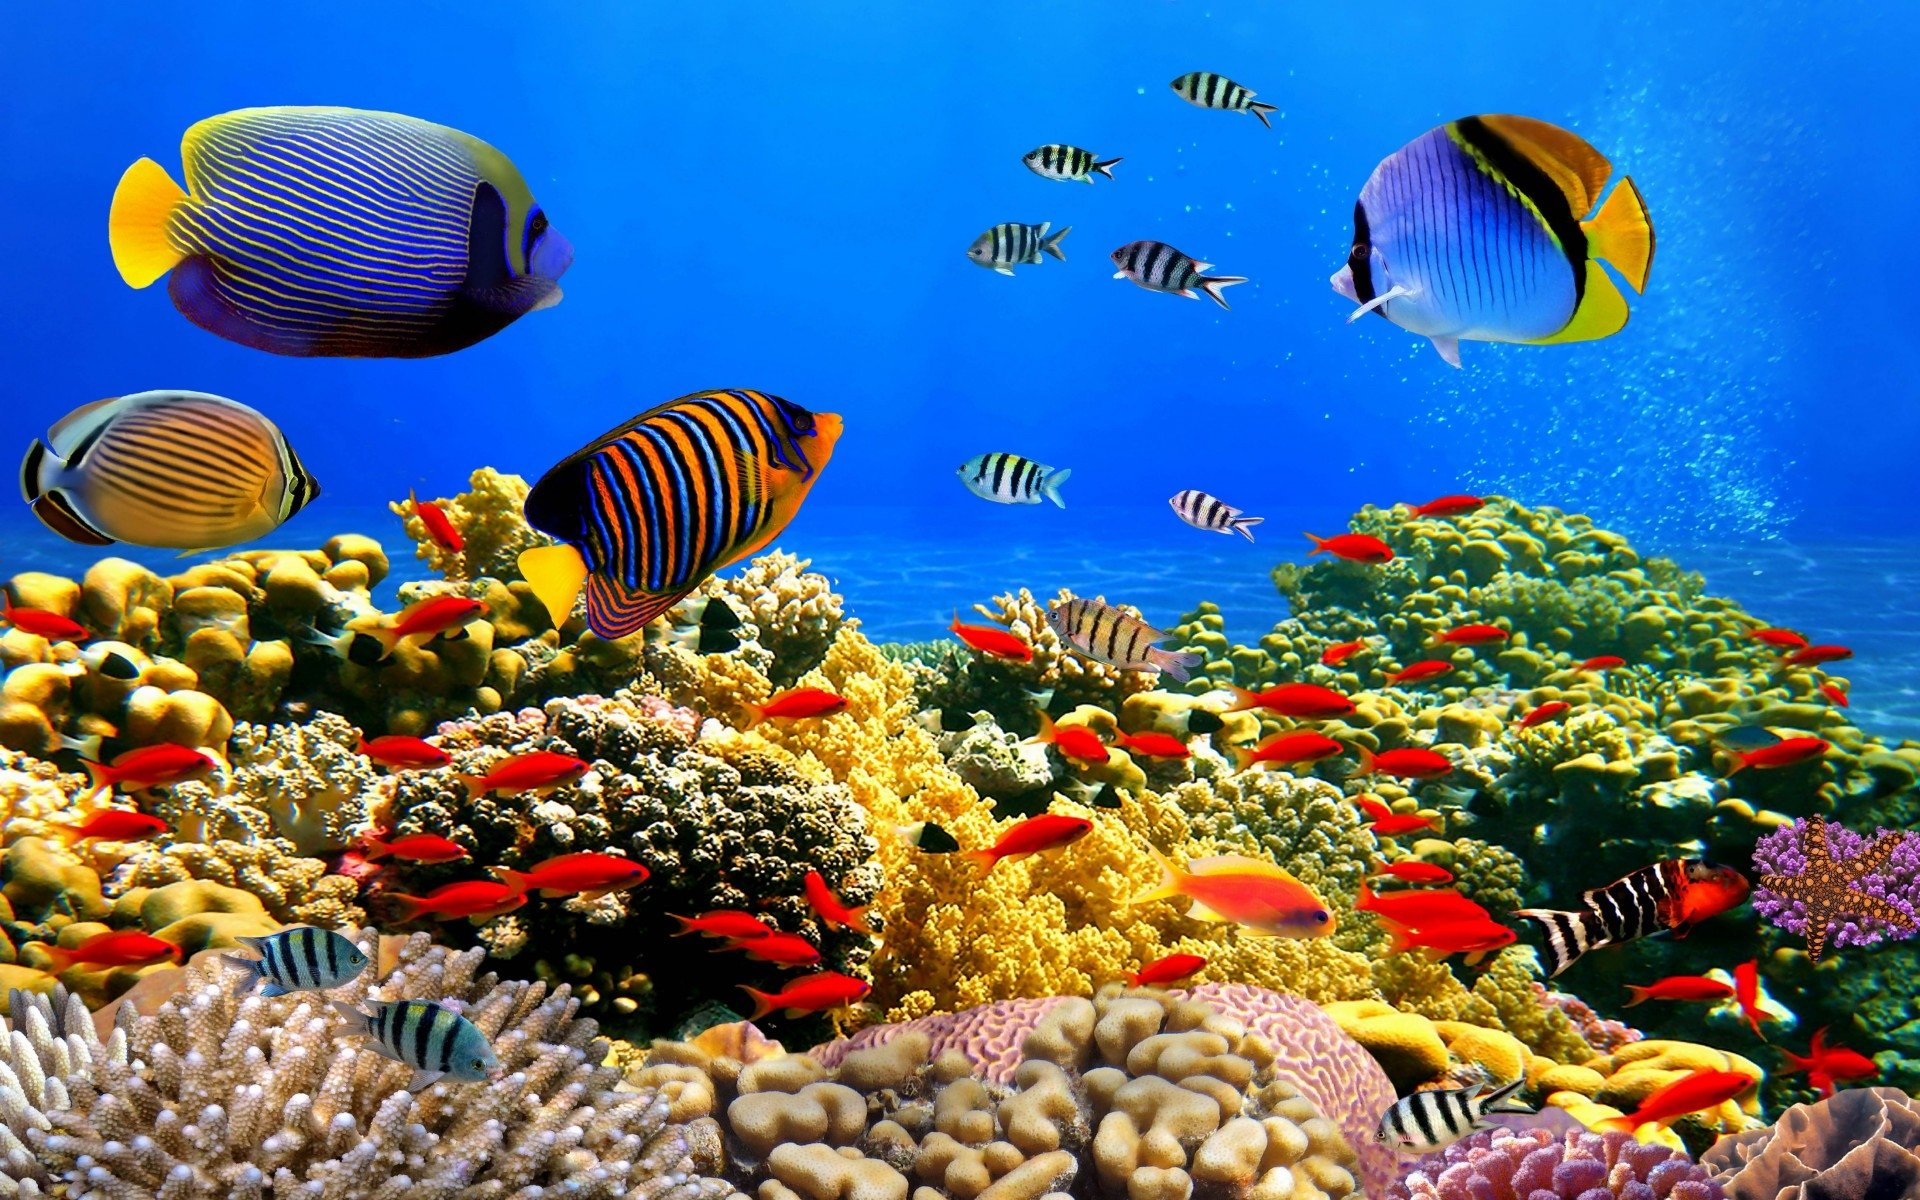 Underwater Iphone Wallpaper Underwater Life Full Hd Fondo De Pantalla And Fondo De